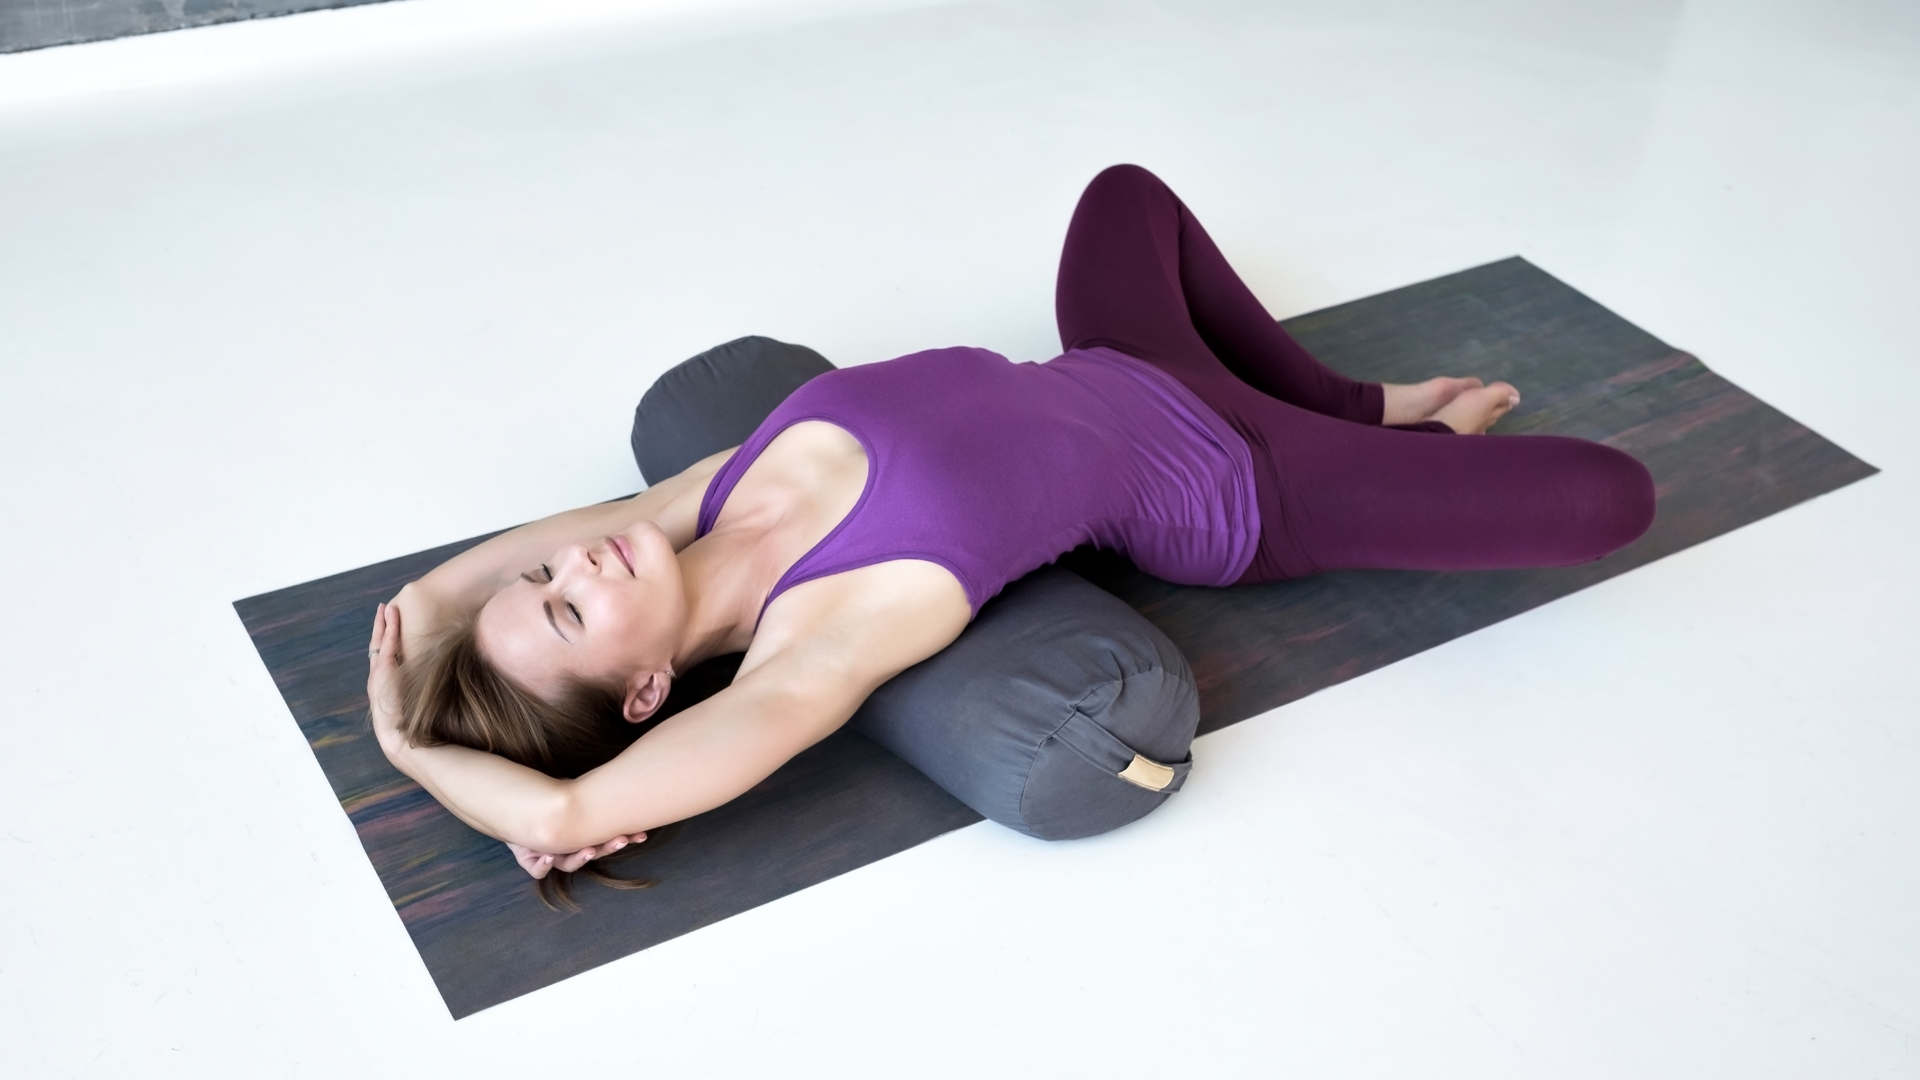 deesse-sommeil-yoga-lapausebaskets-sport-entreprise